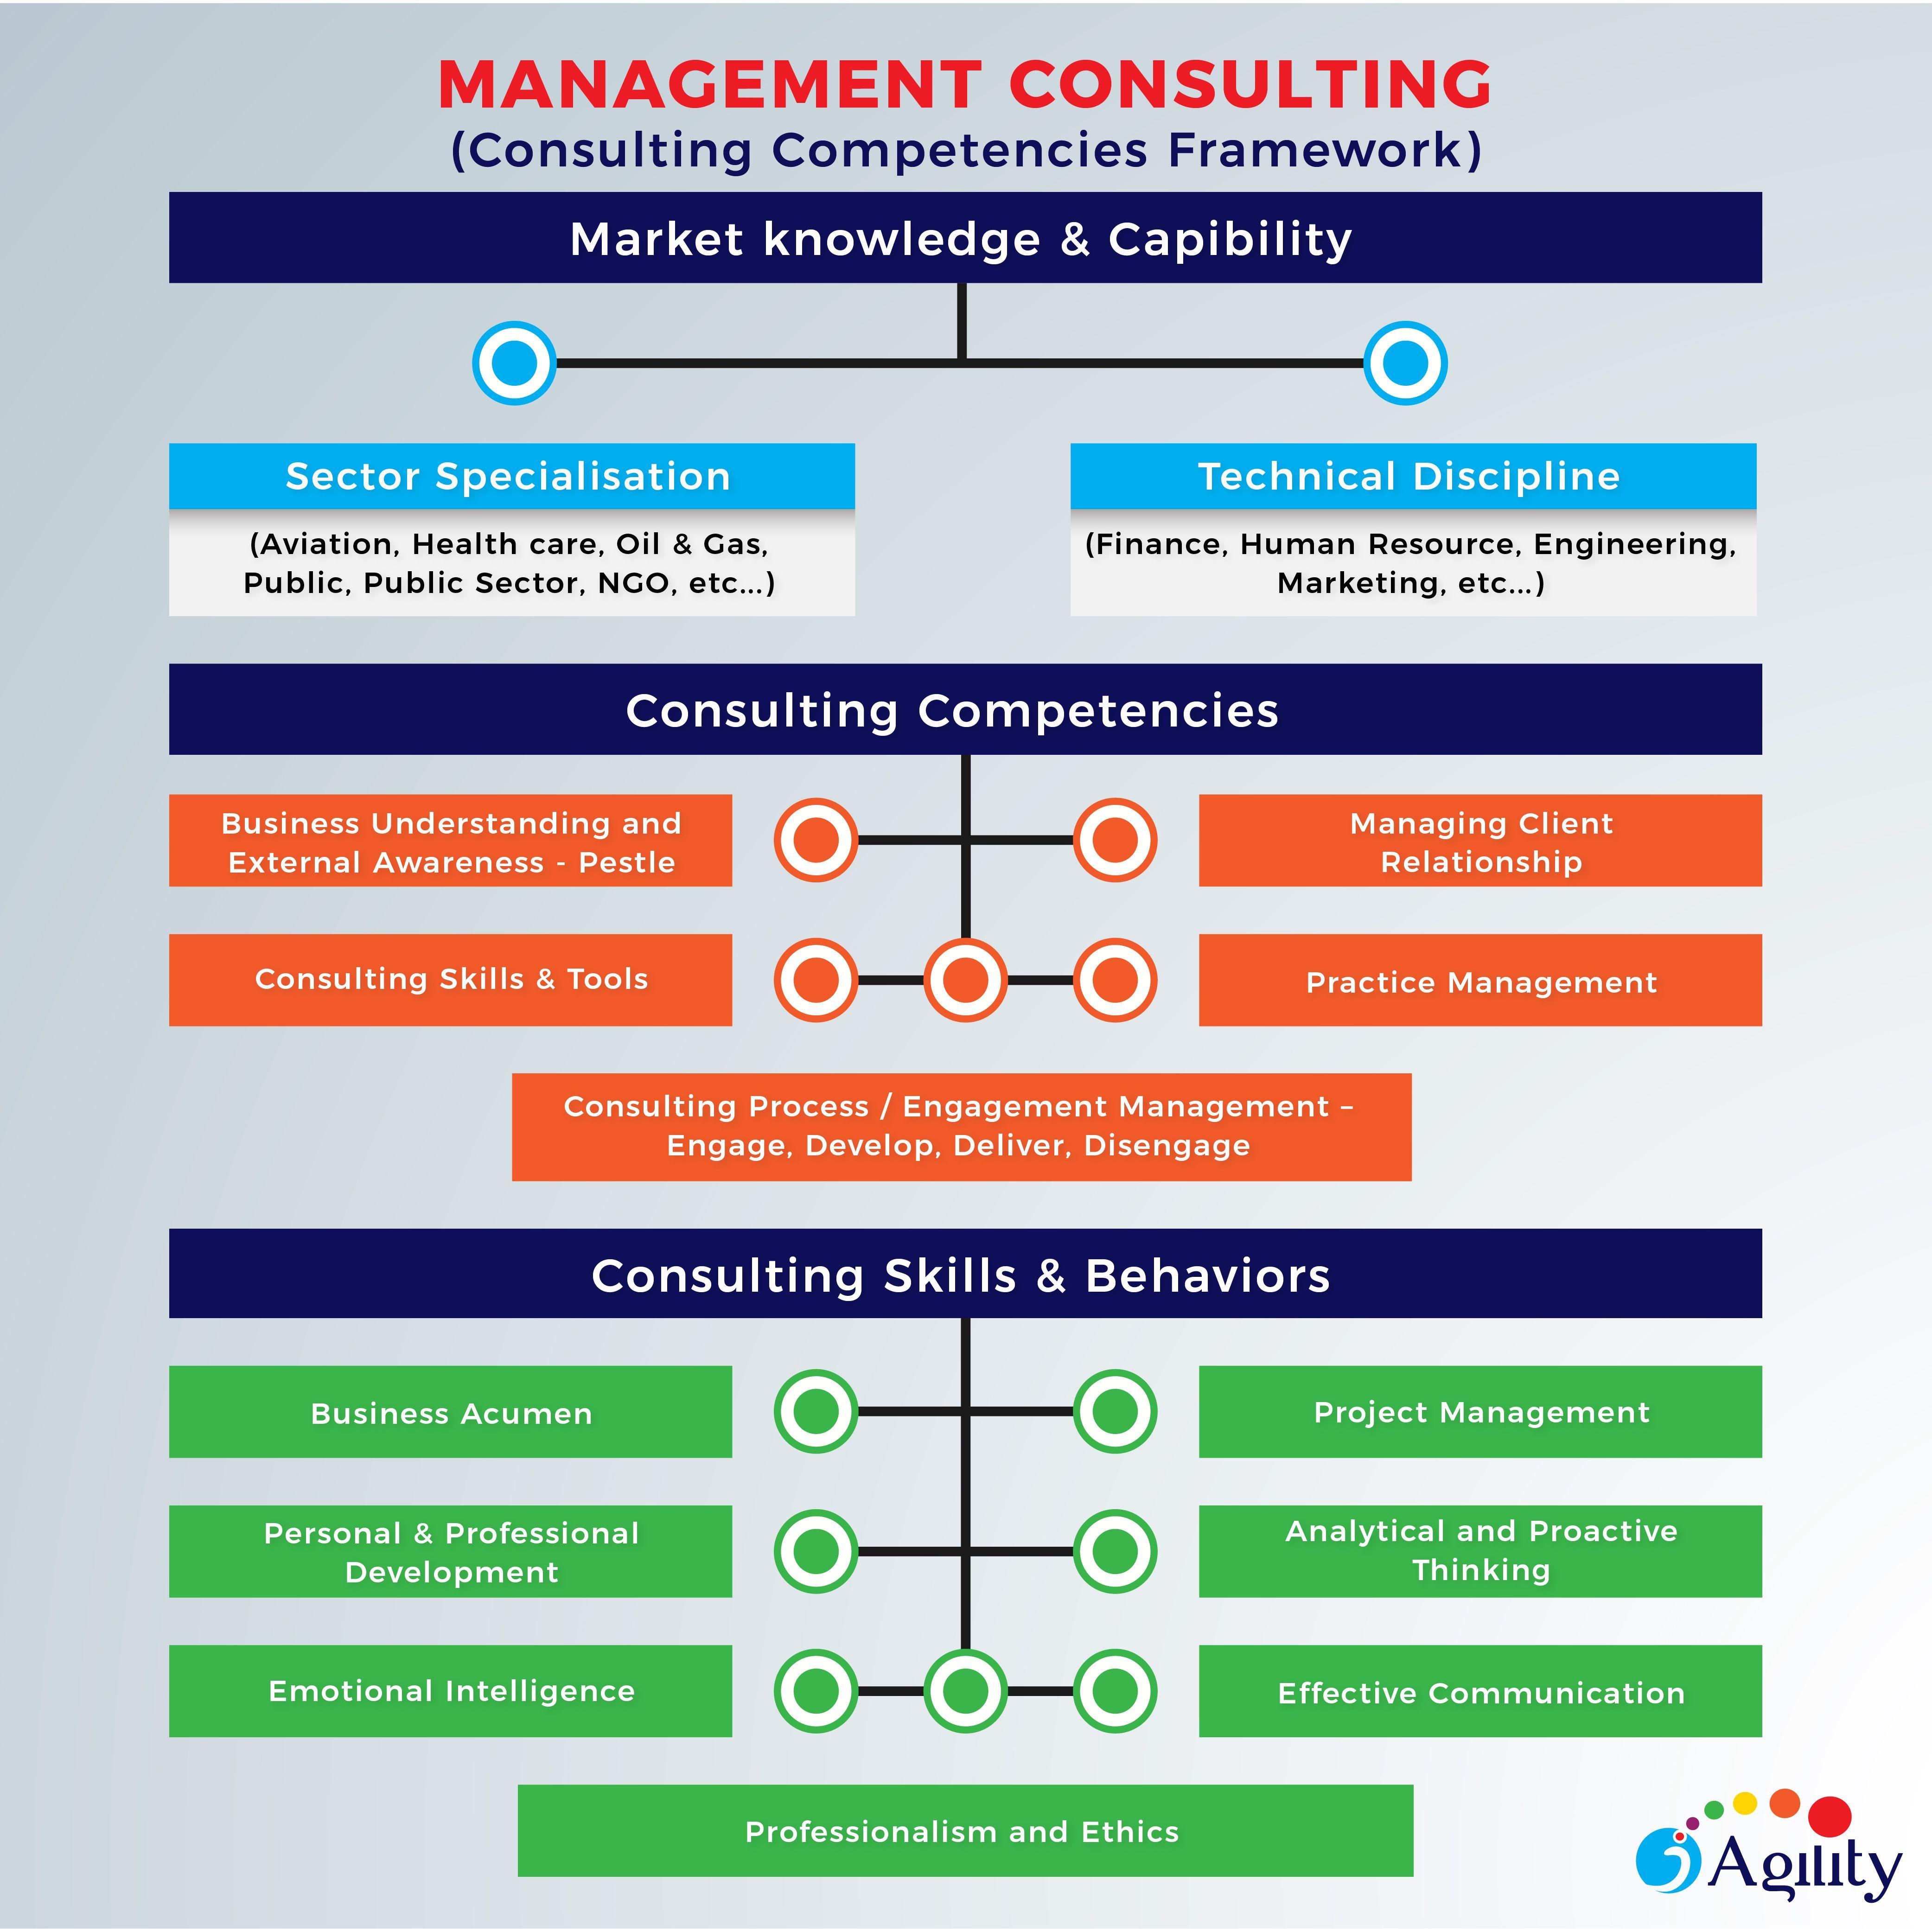 Management consulting competencies framework management